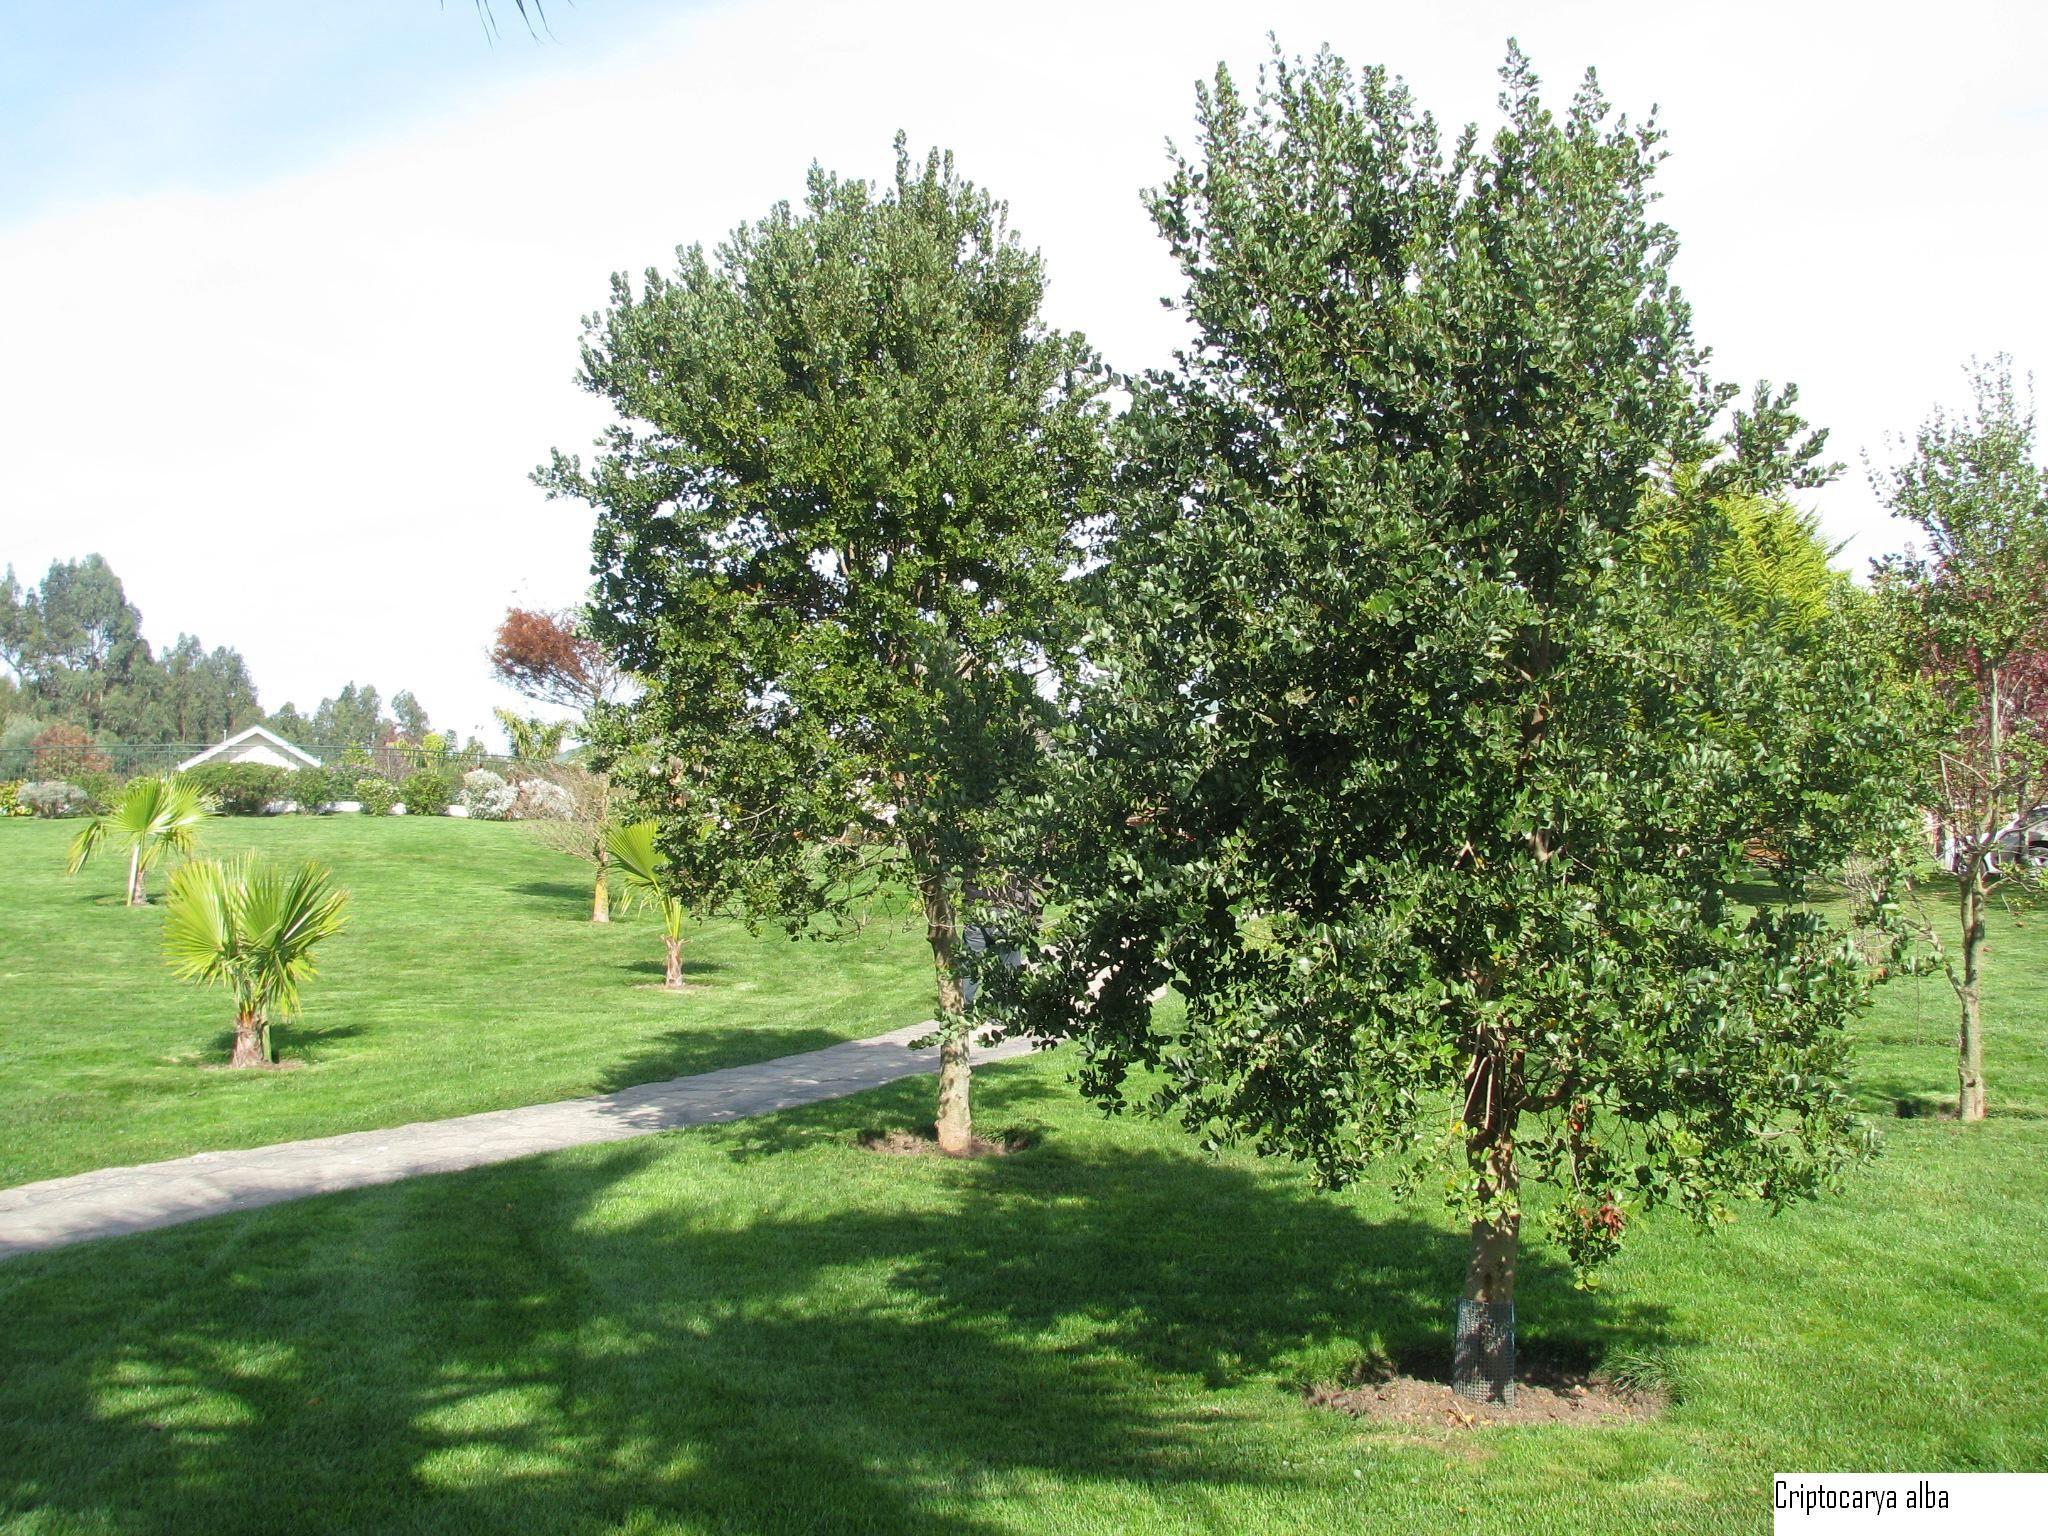 Peumo arbol que crece hasta 20 mts semisombra resiste for Arboles crecimiento rapido hoja perenne